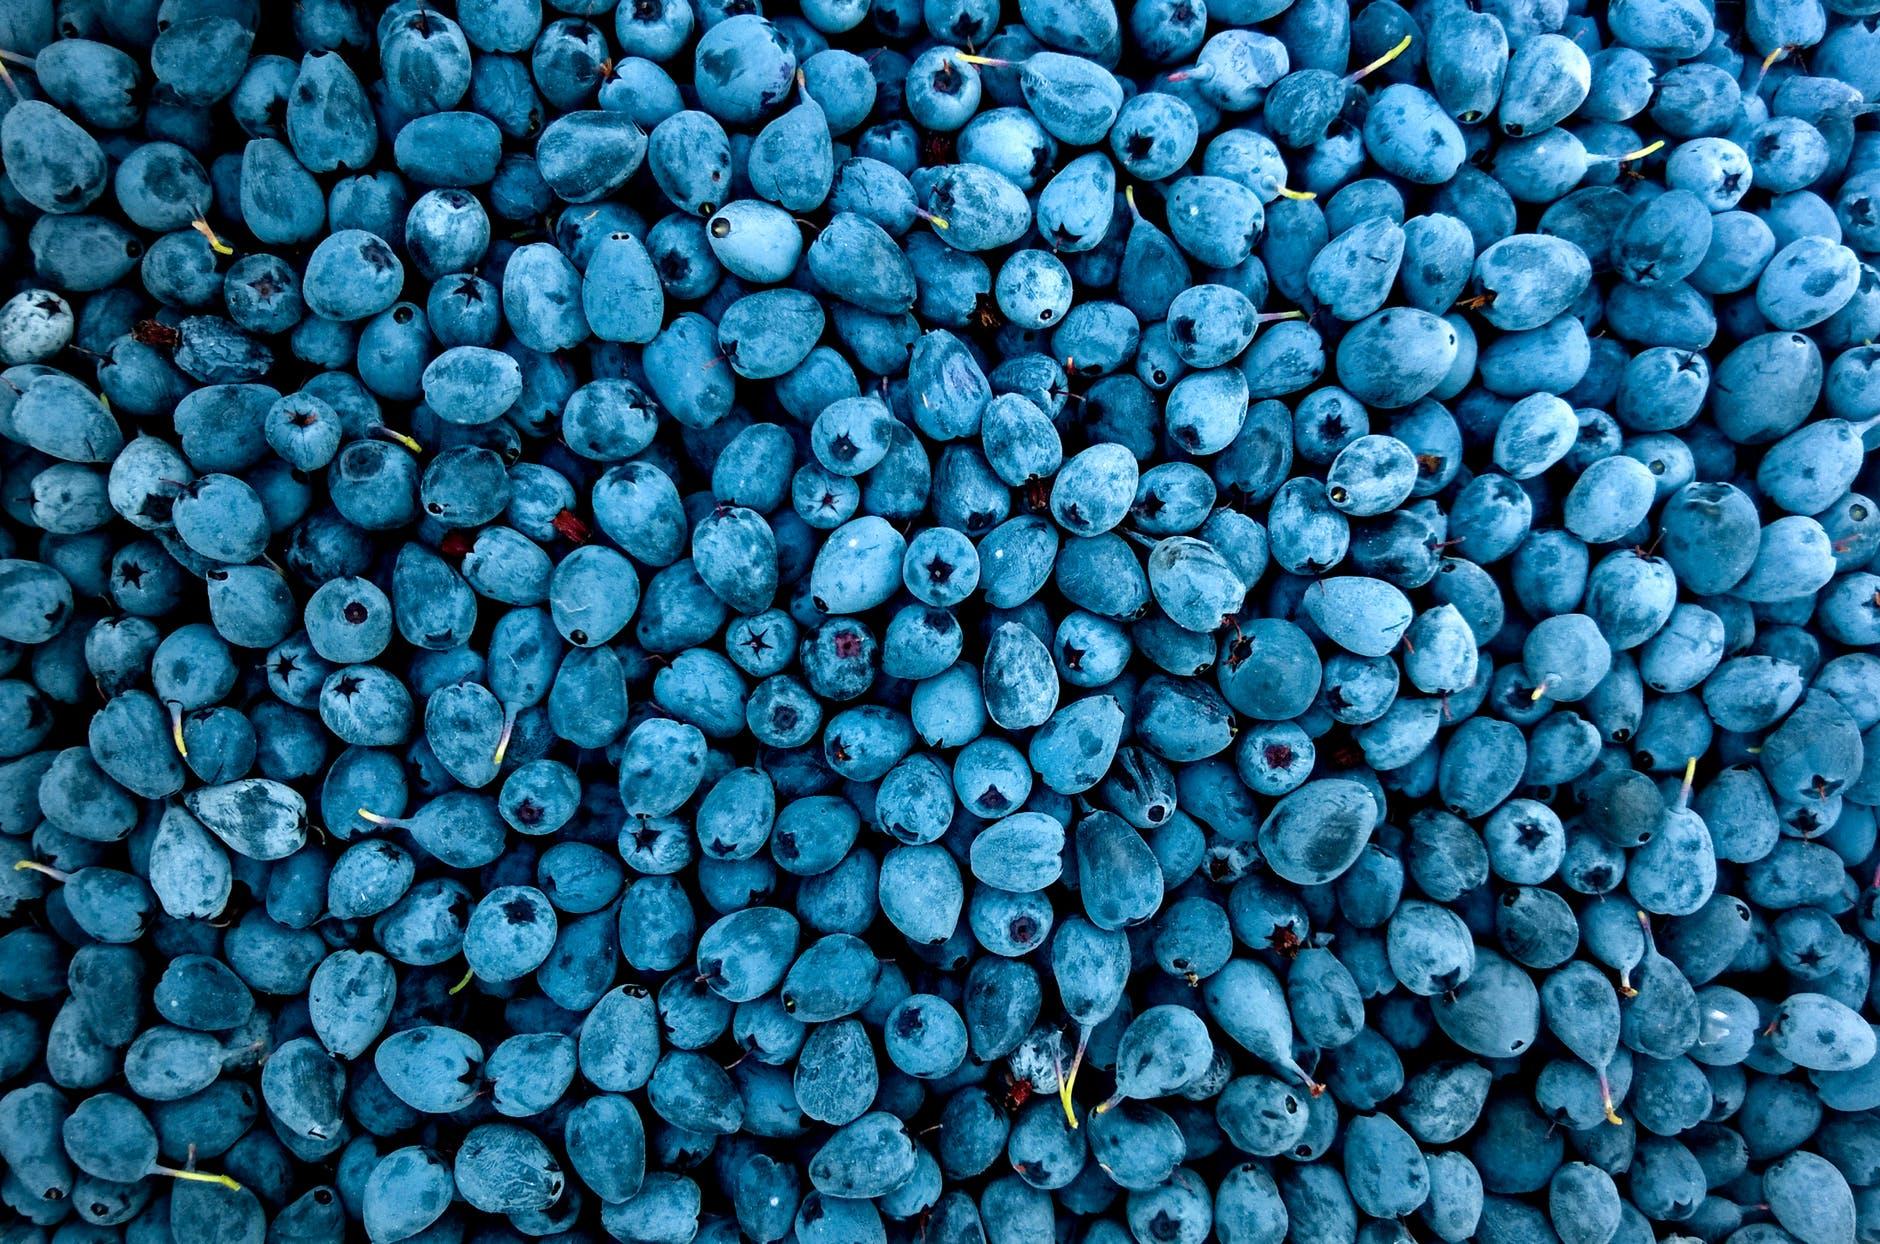 Blueberries to prevent heart attacks